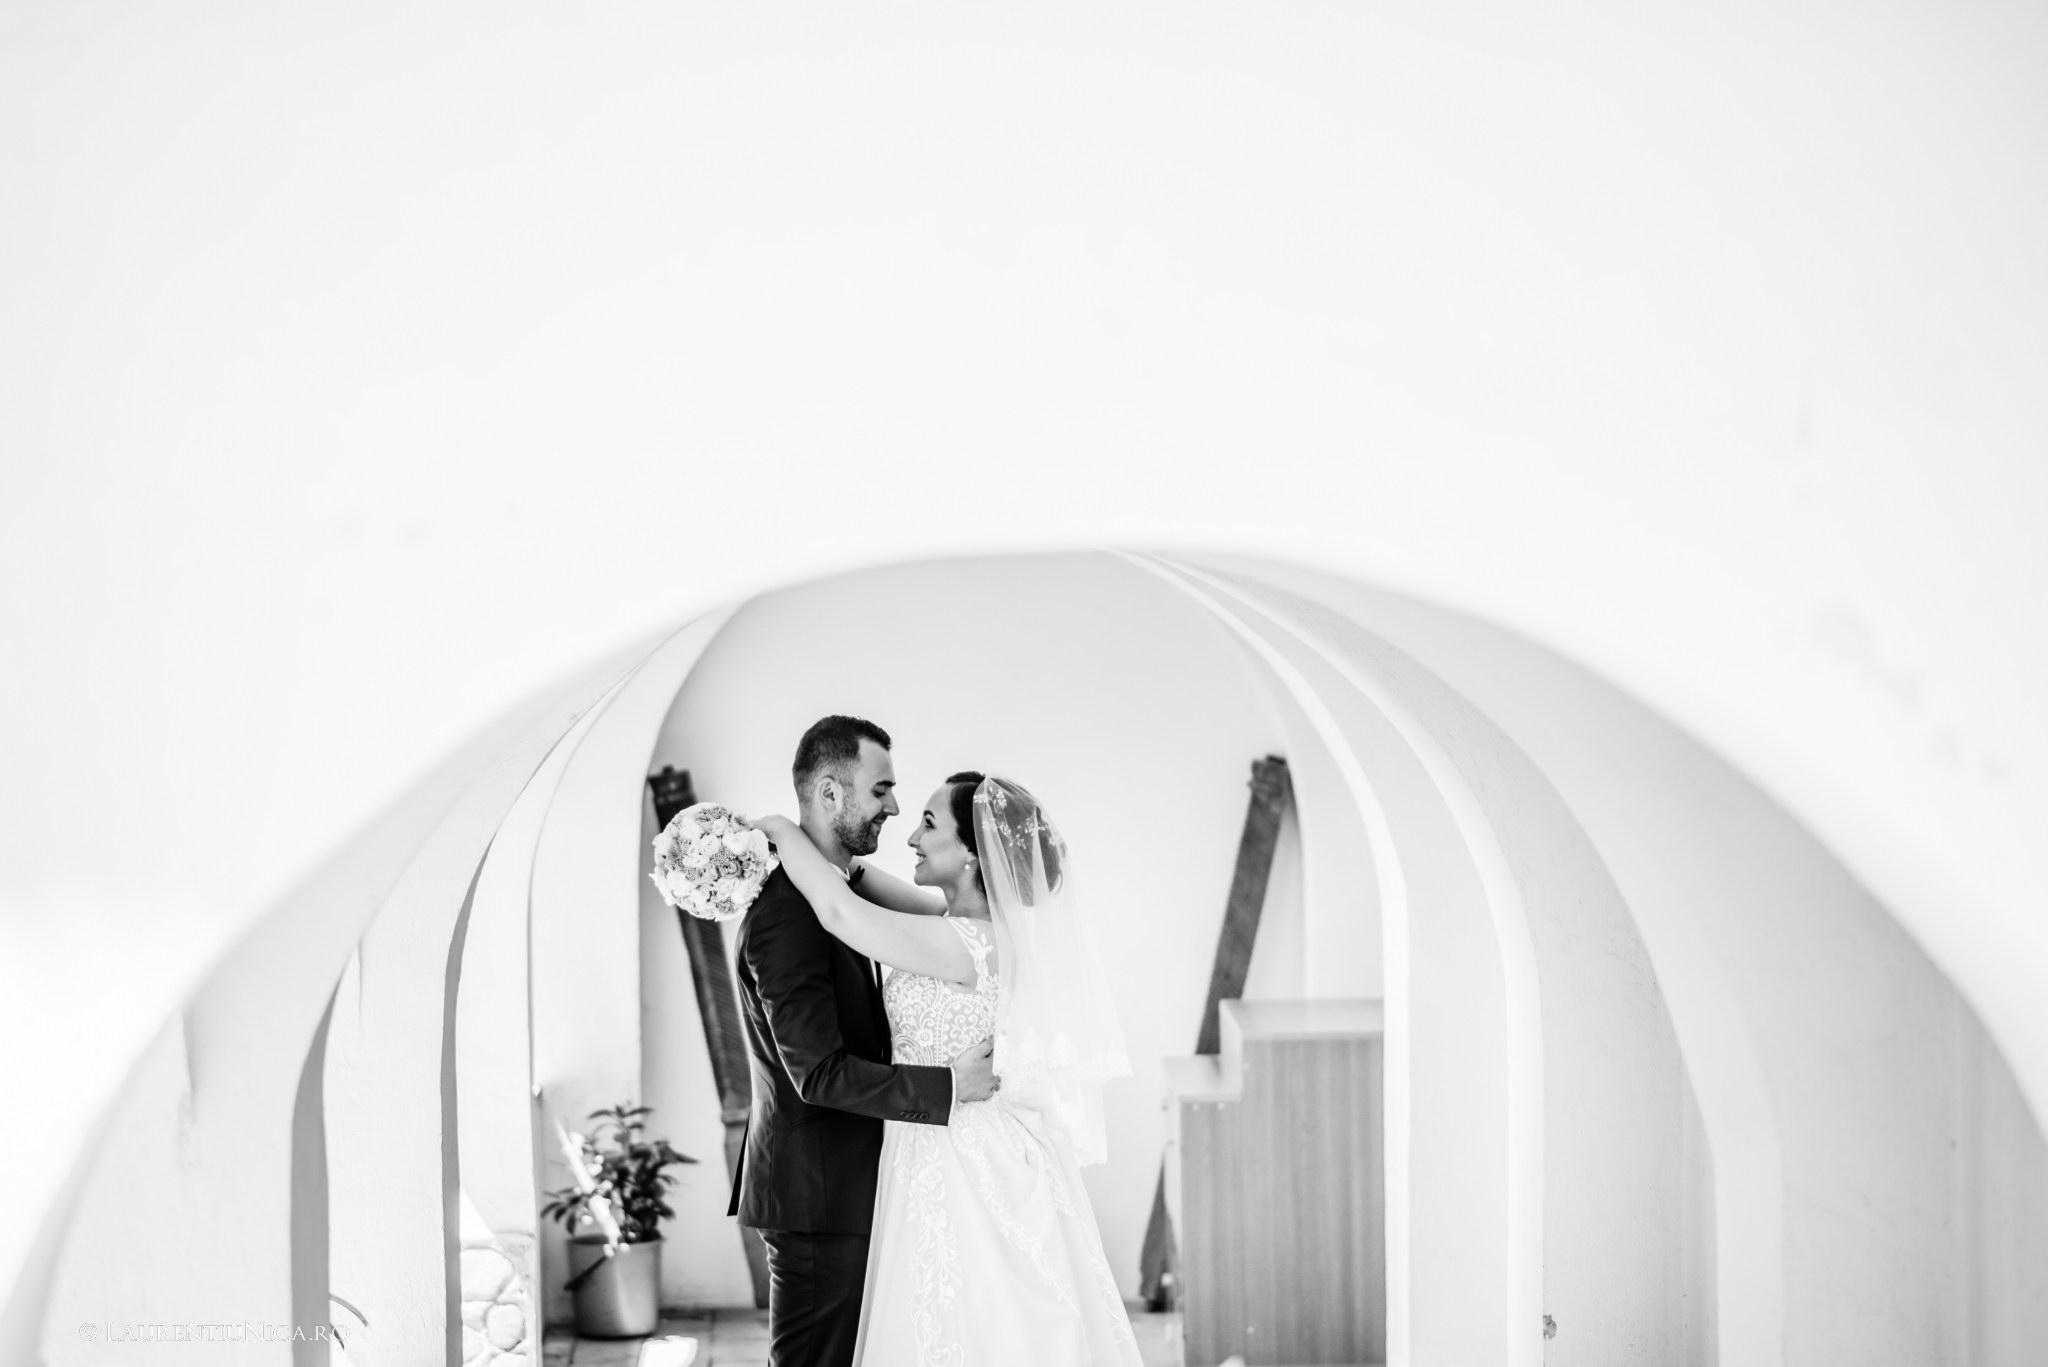 daiana si madalin fotograf nunta laurentiu nica targu jiu gorj 15 - Daiana & Madalin | Fotografii nunta | Targu-Jiu | Gorj